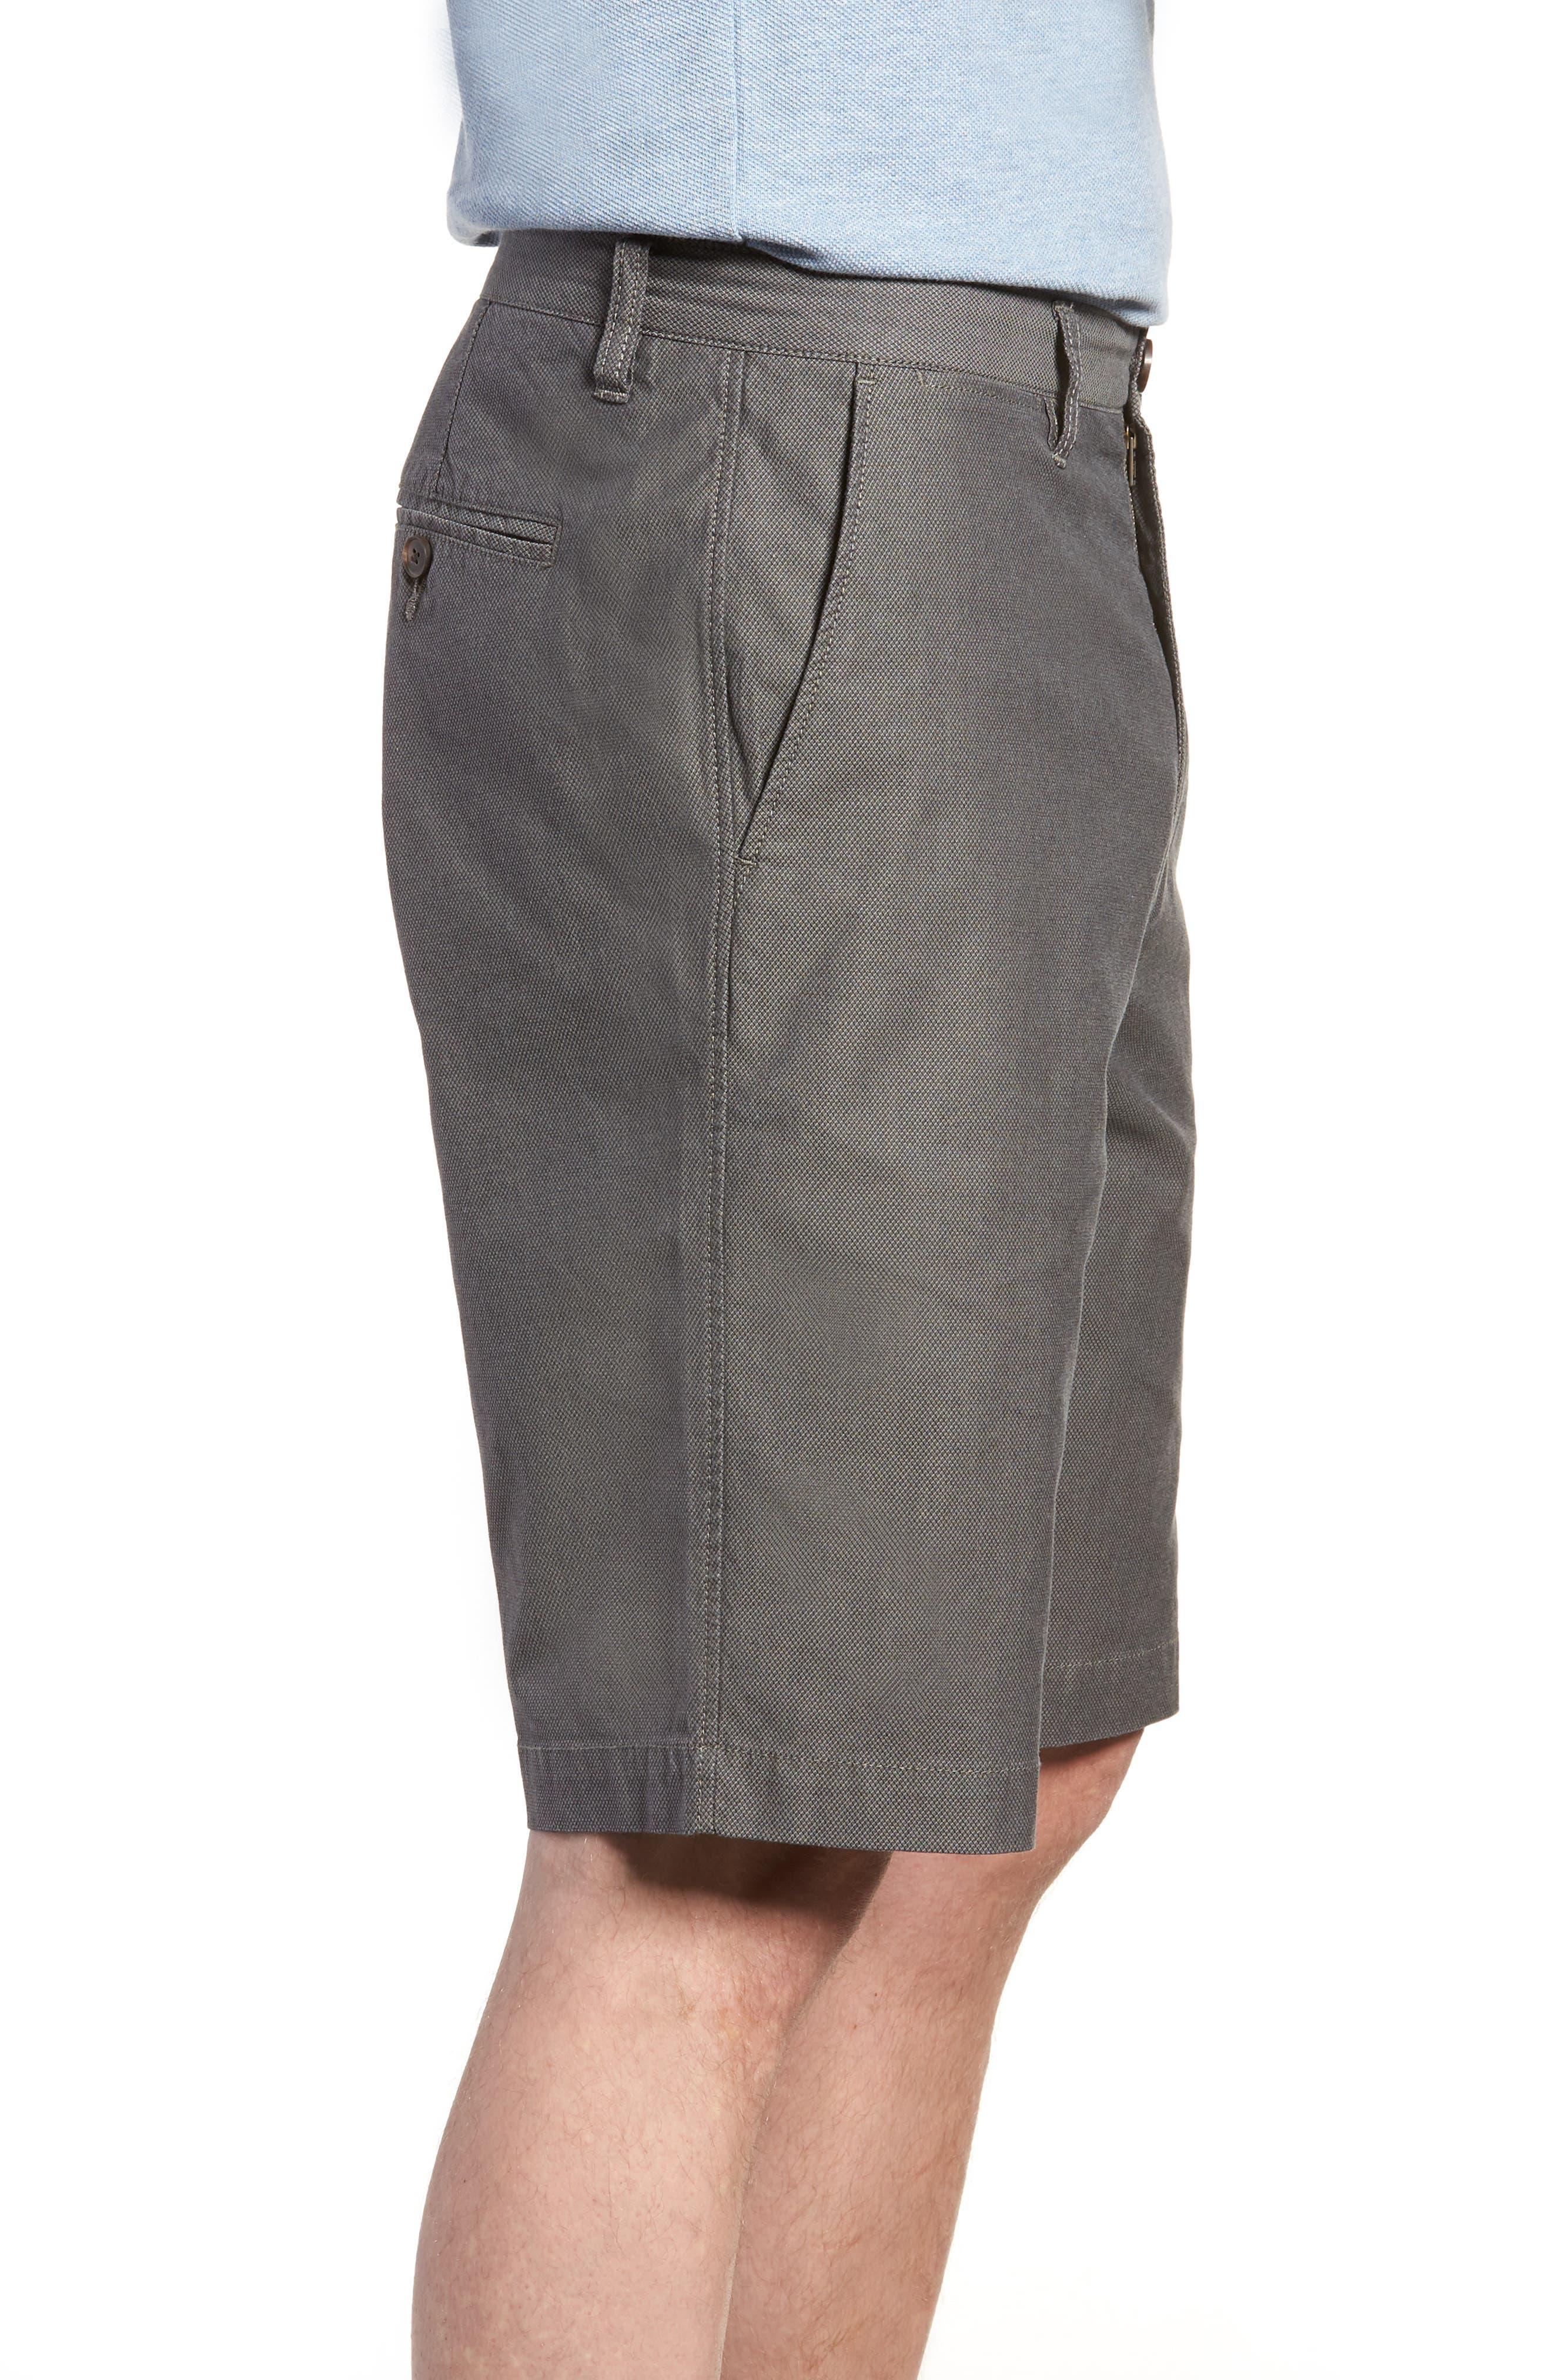 Army Bay Regular Fit Shorts,                             Alternate thumbnail 3, color,                             Granite